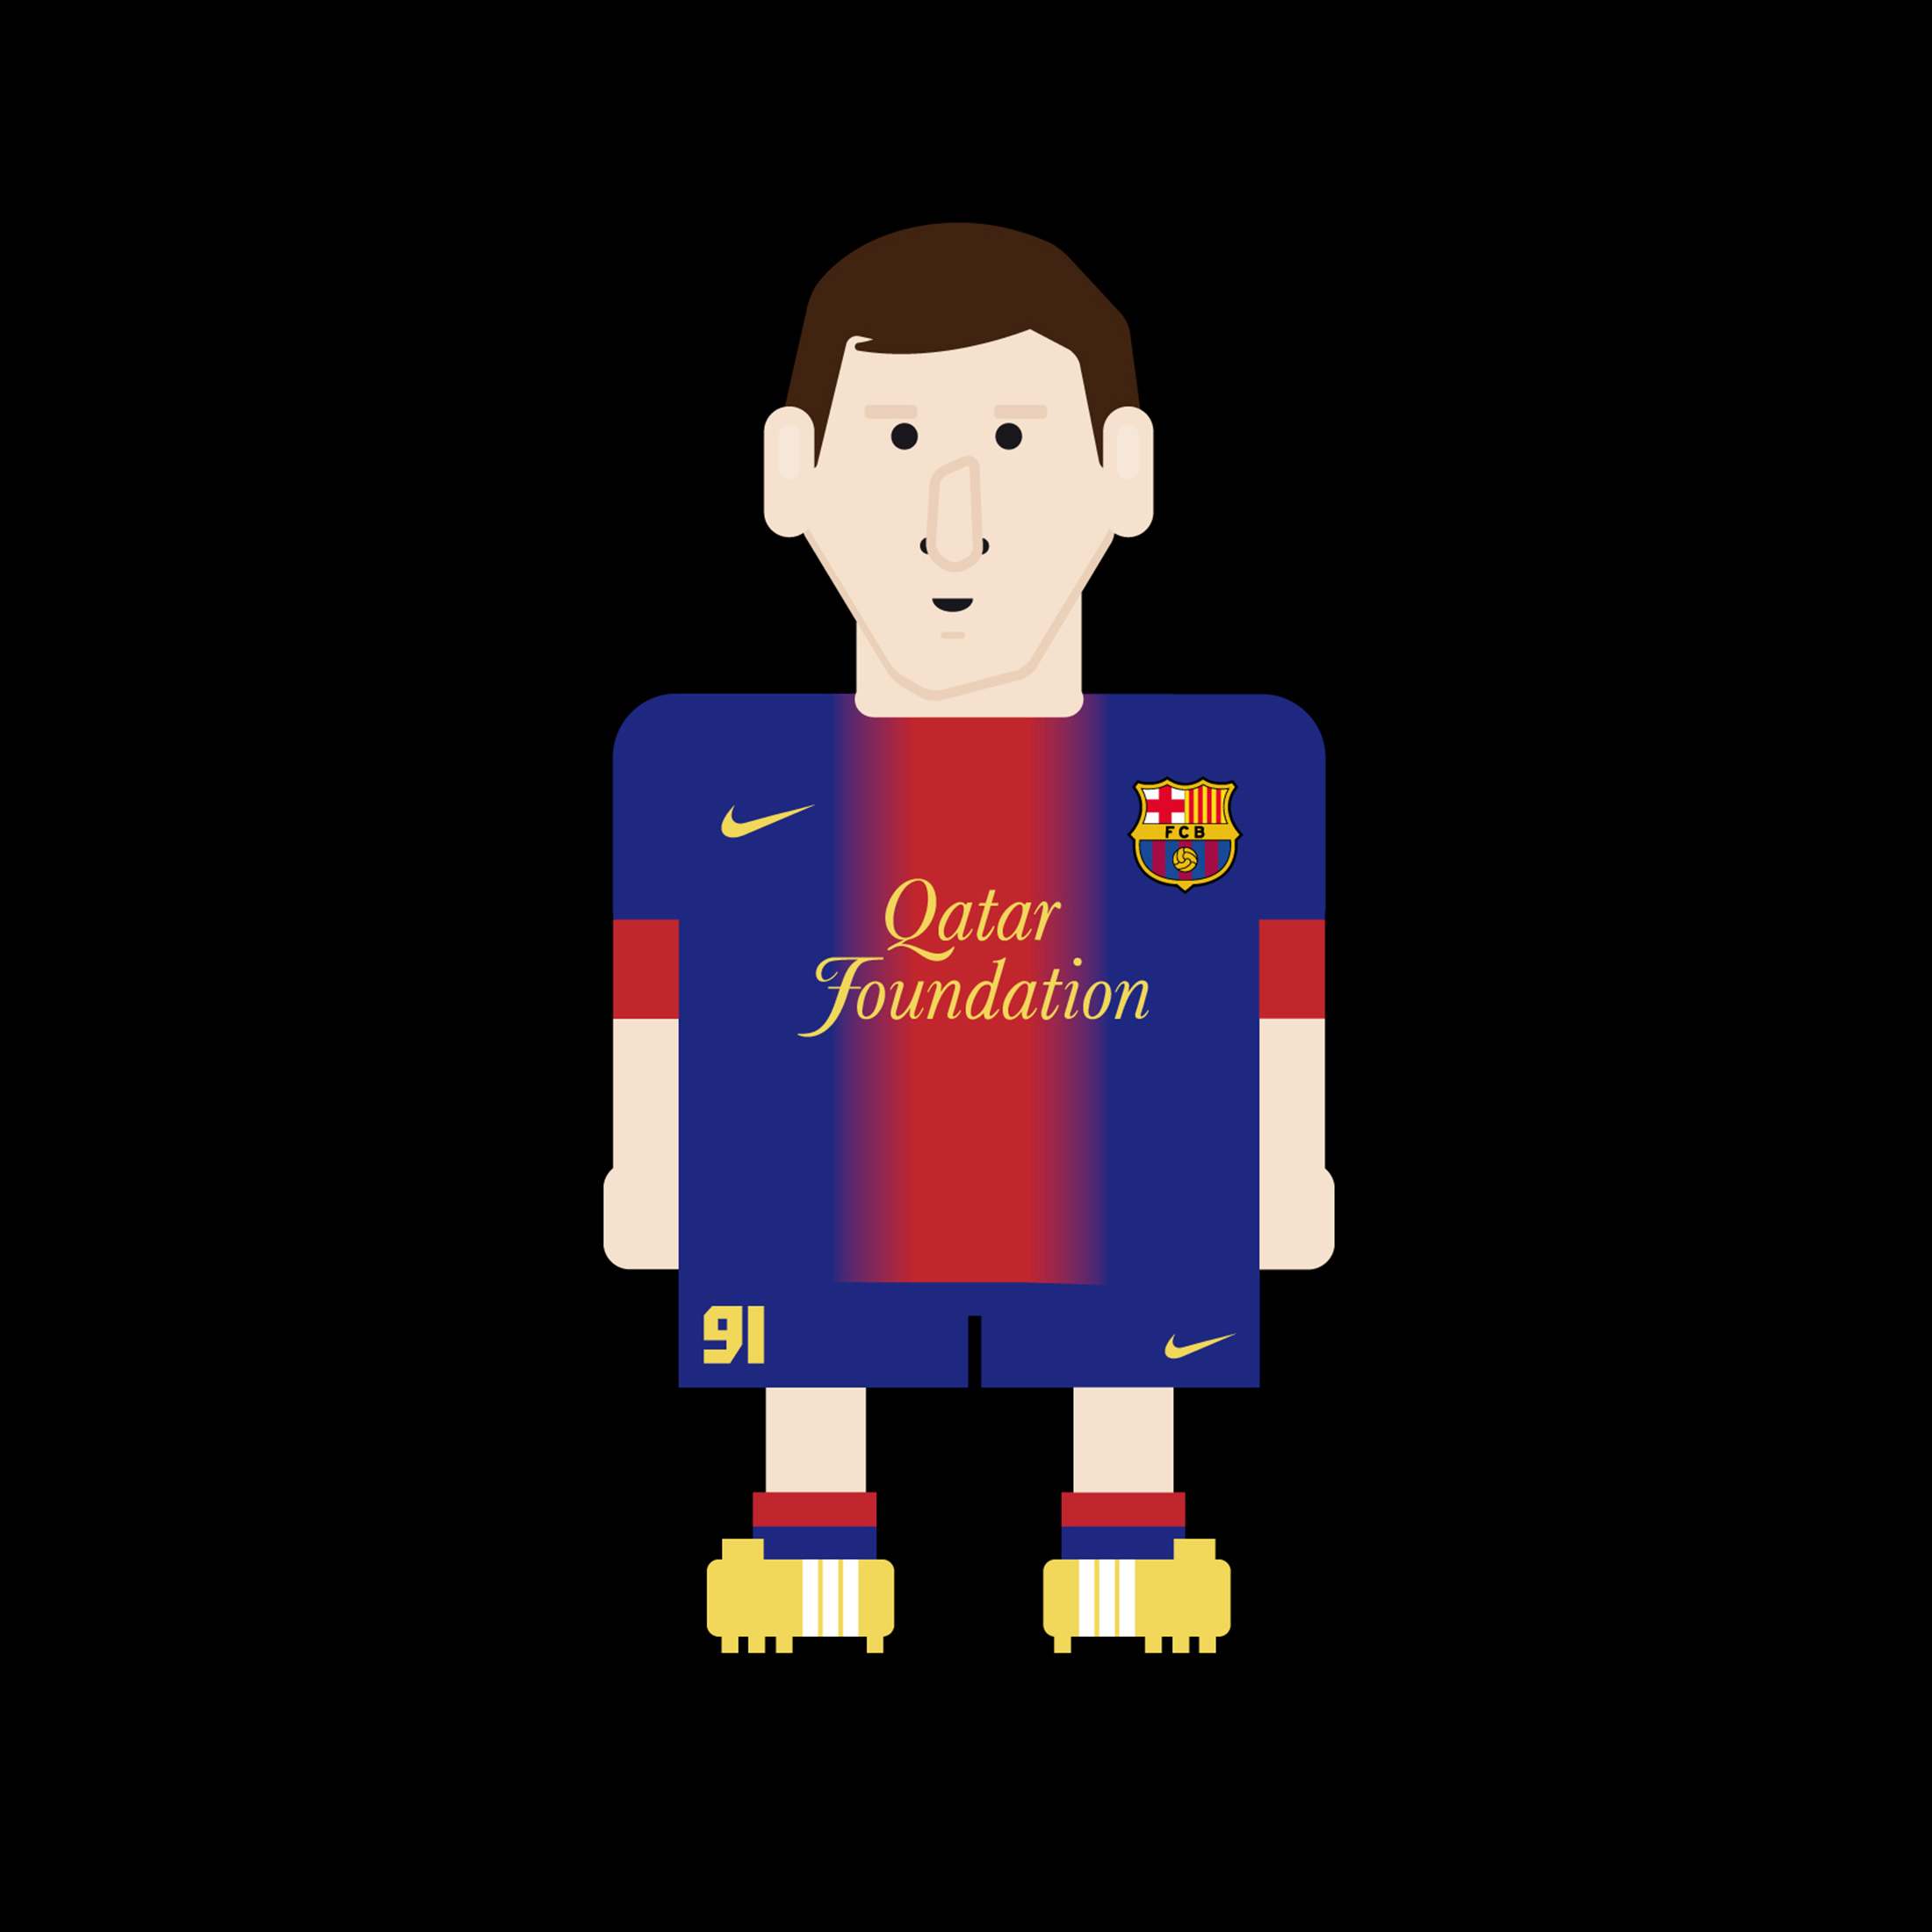 messi-fc-barcelona-tribute-91-goals